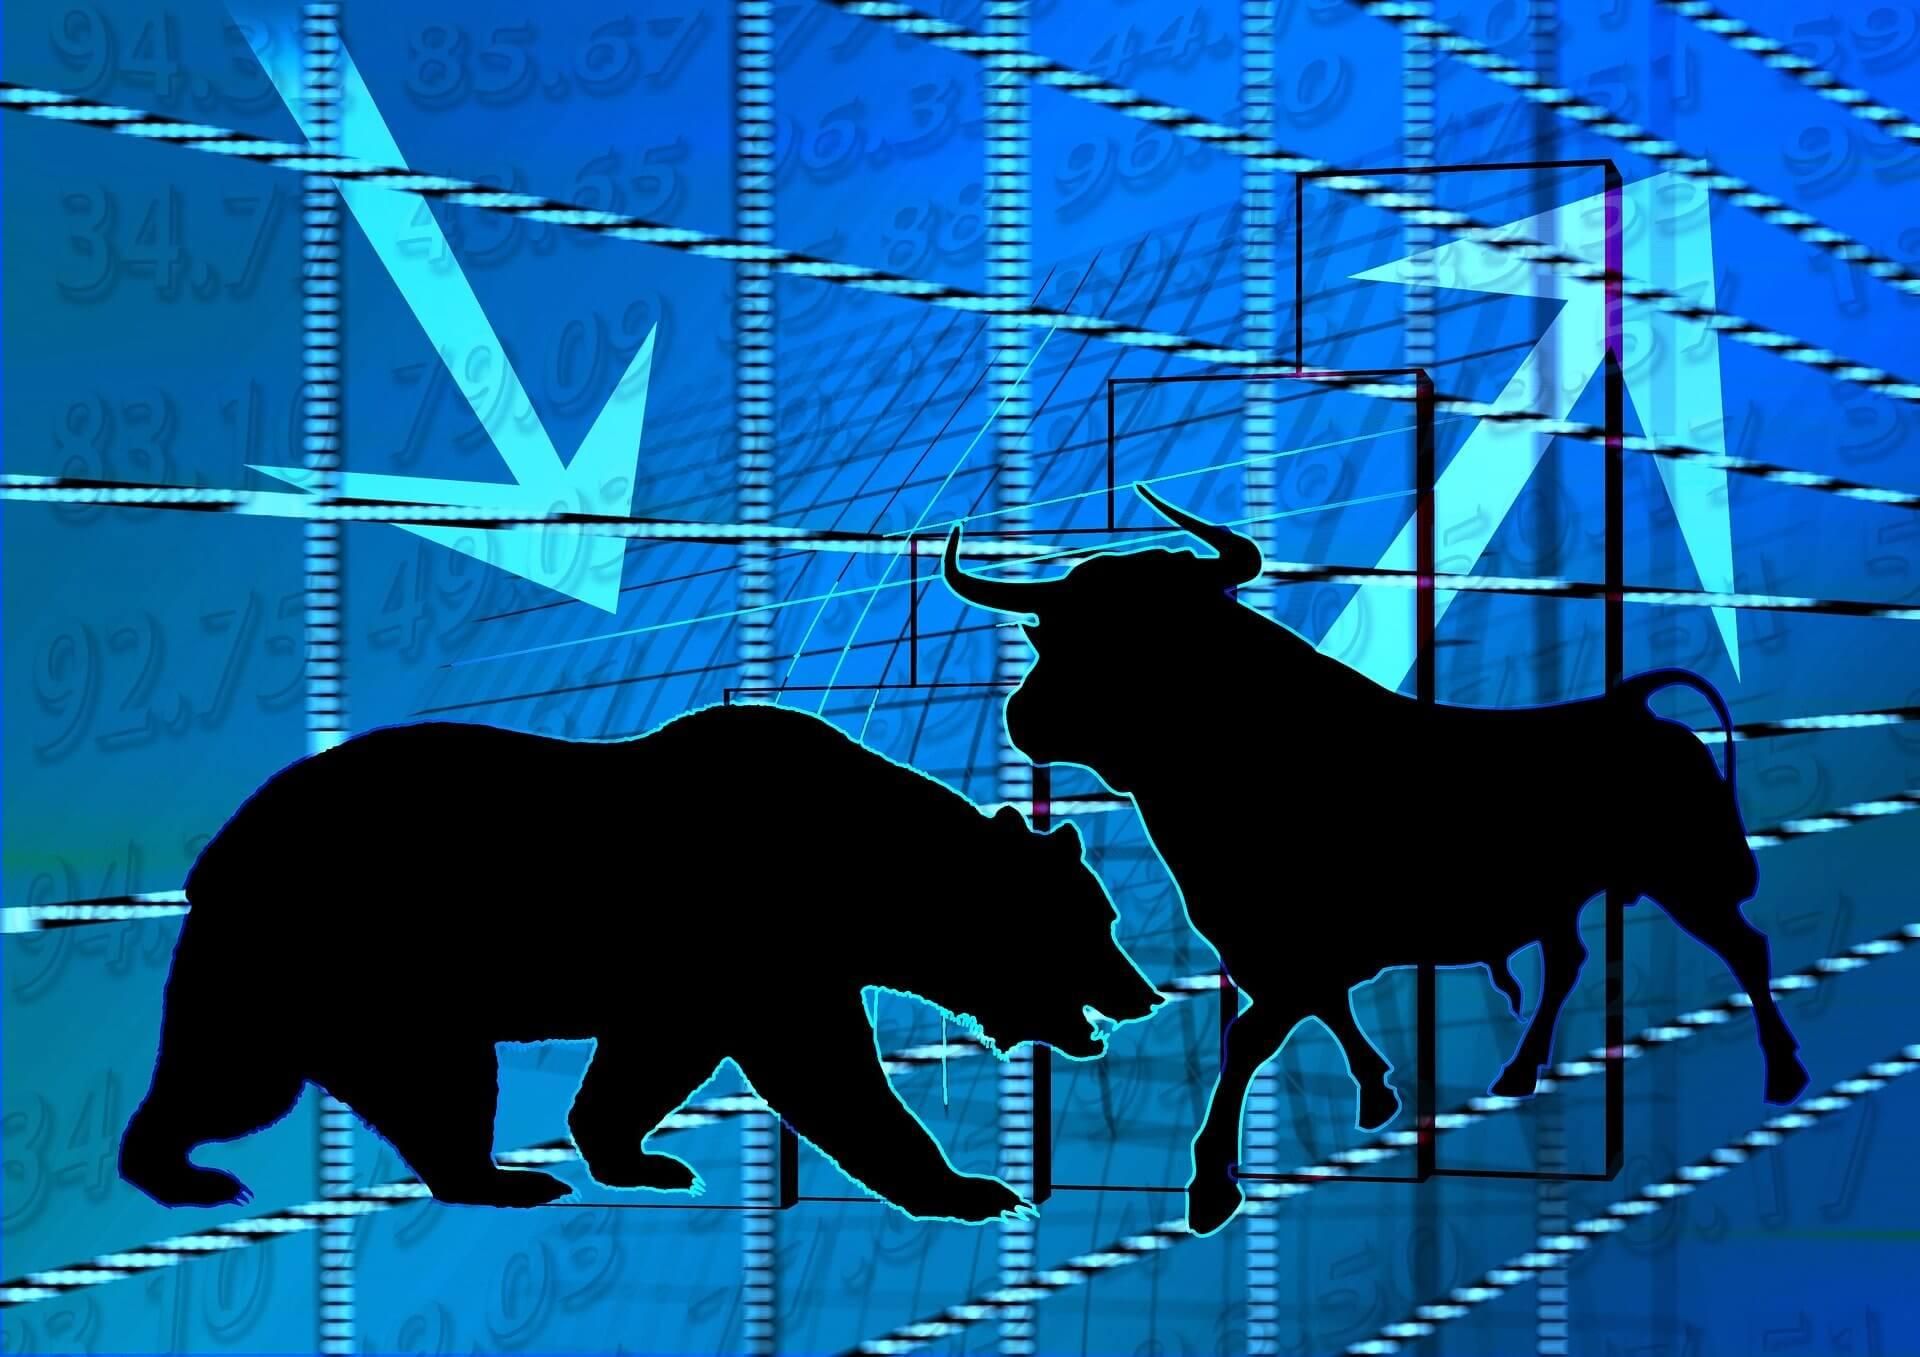 Stock Market Indices - Close to the peak